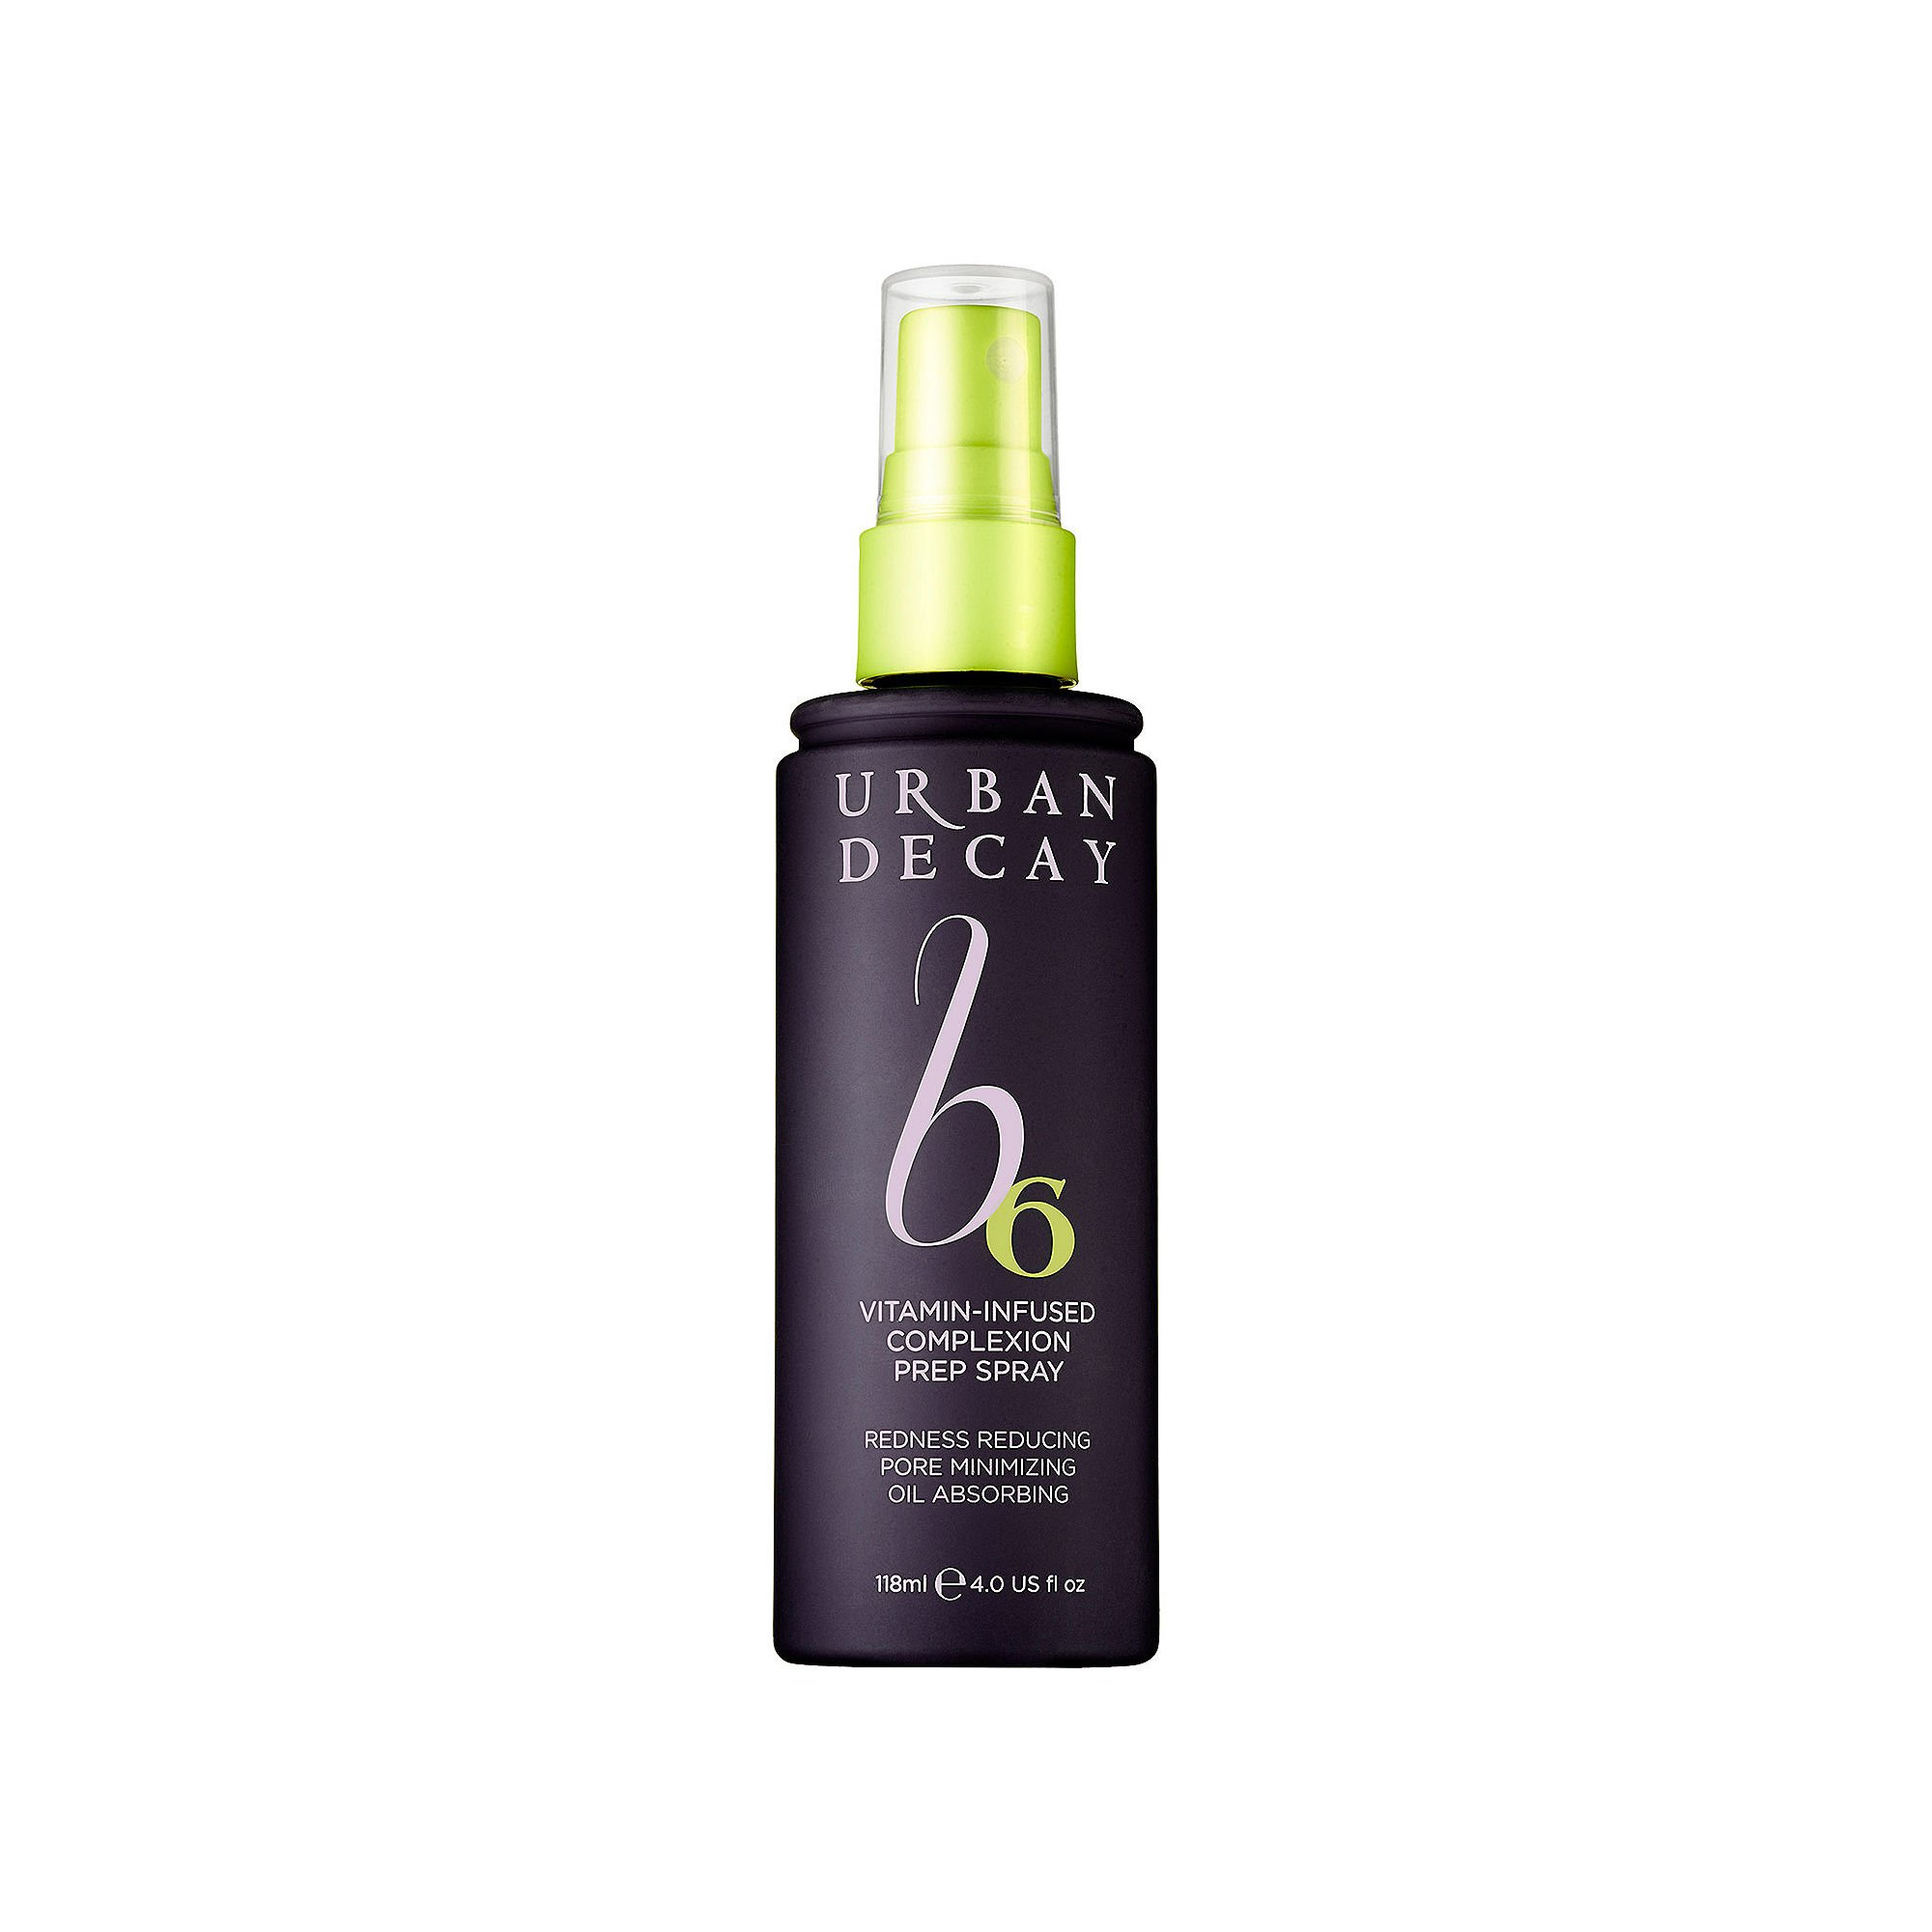 Urban Decay B6 Vitamin-Infused Complexion Prep Spray 4.0 oz